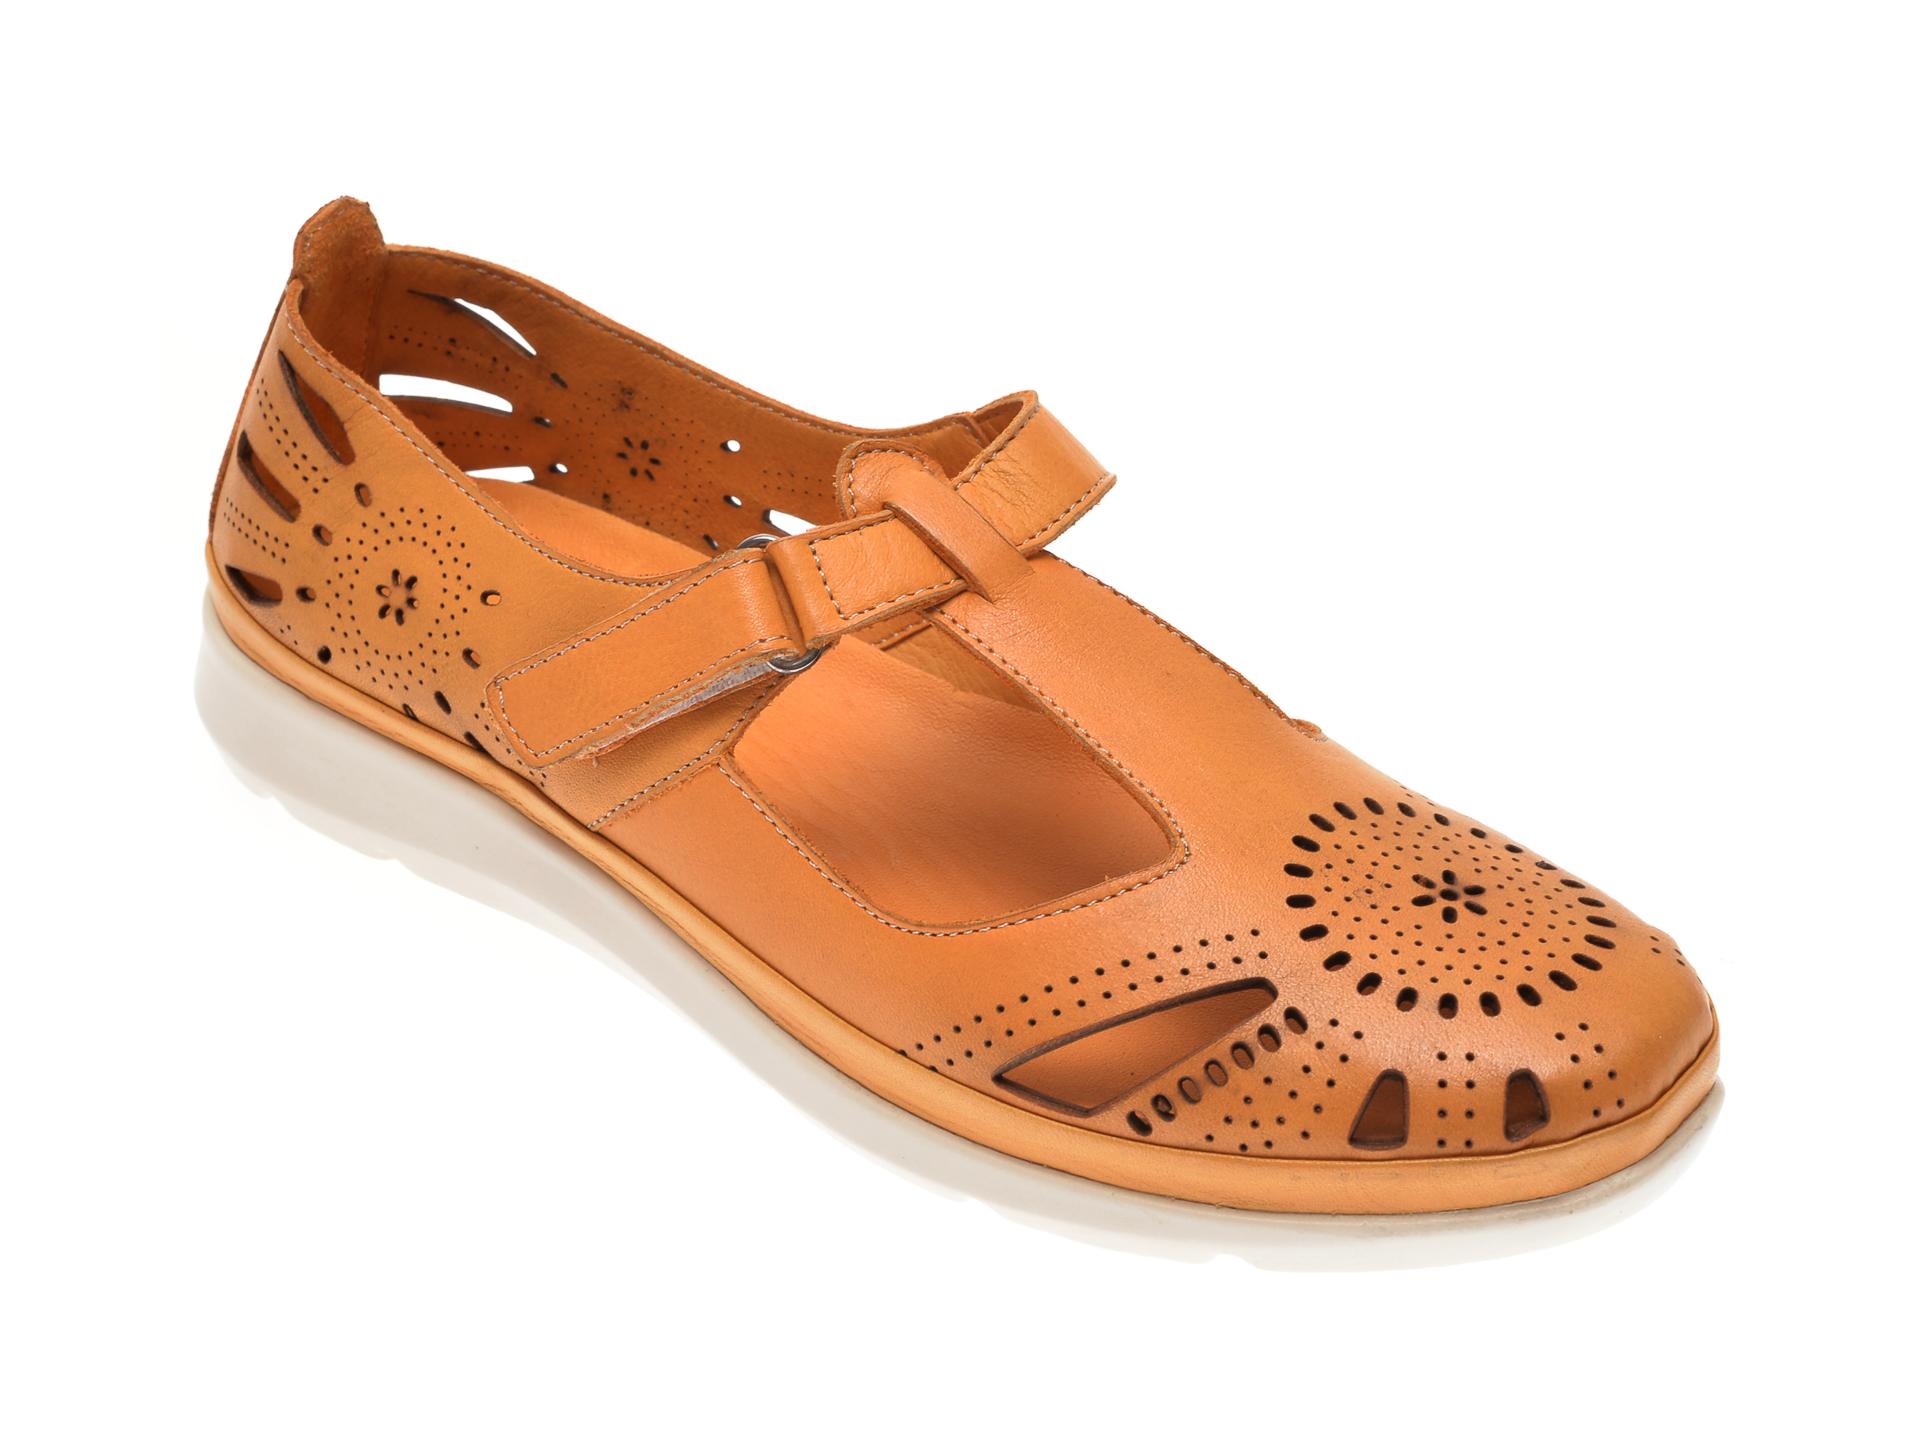 Pantofi X TREND galbeni, 602, din piele naturala